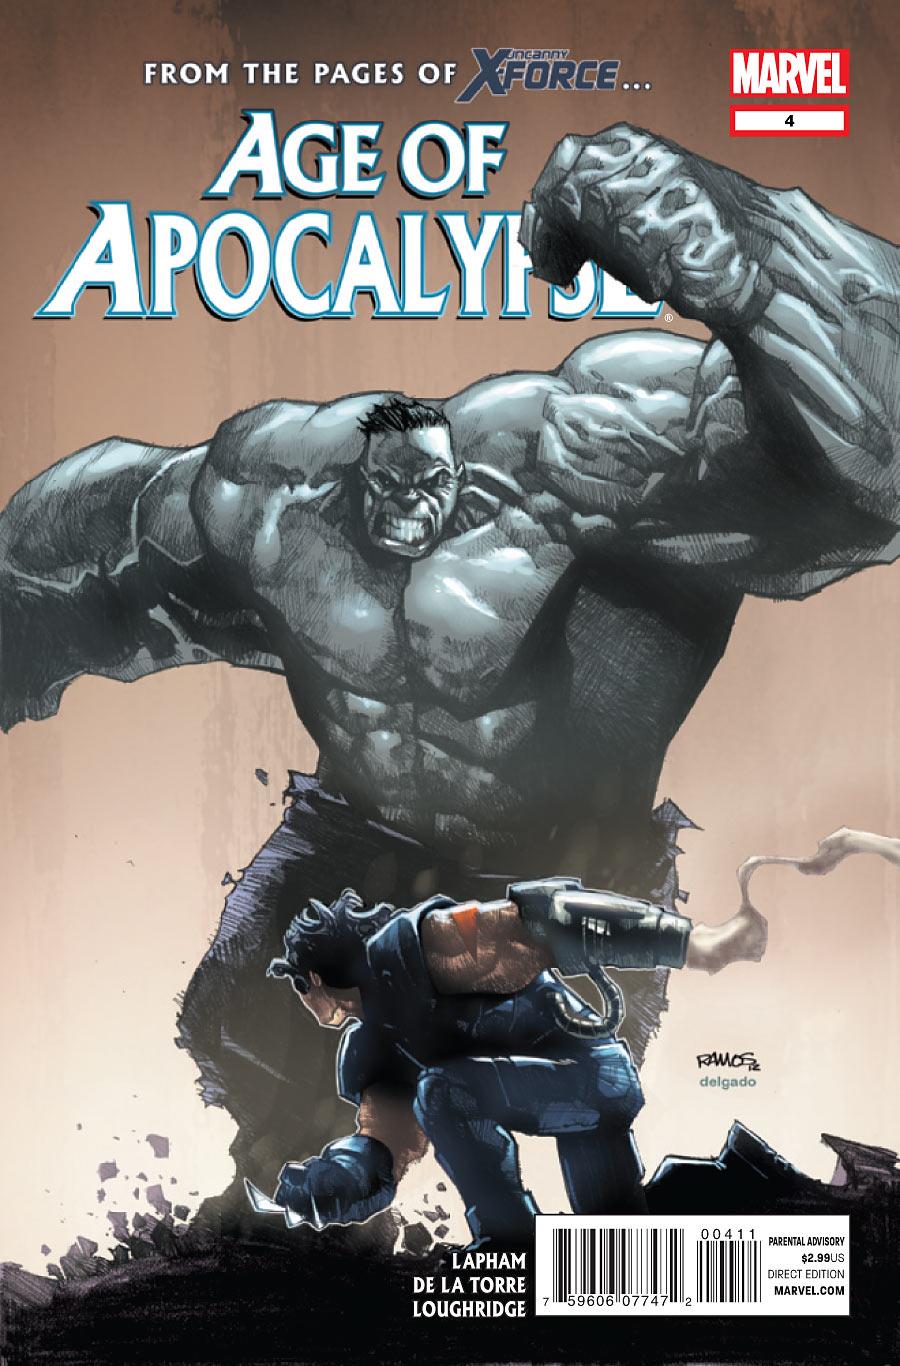 Age of Apocalypse Vol 1 4 | Marvel Database | FANDOM powered